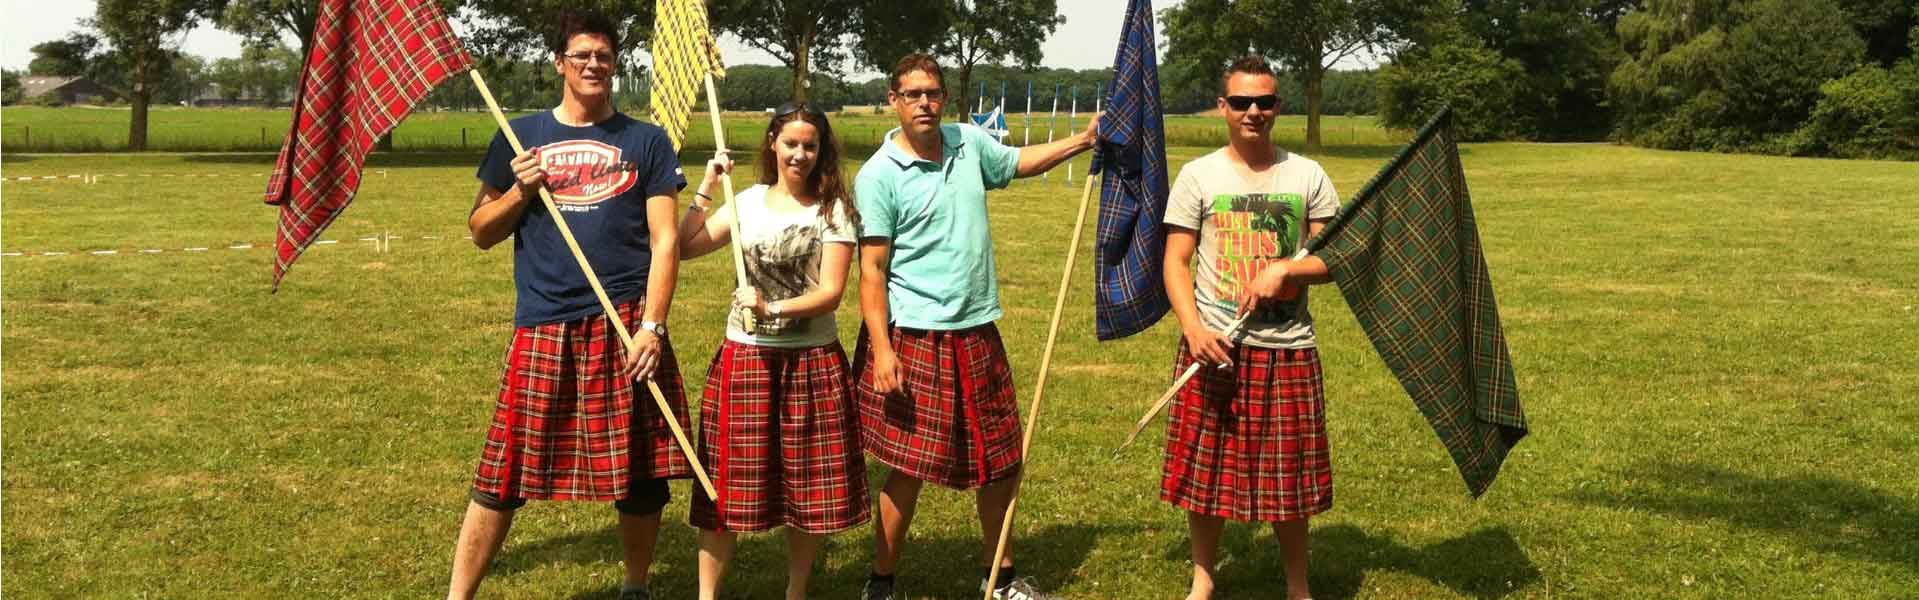 Highland Games | Bedrijfsuitjes in Twente